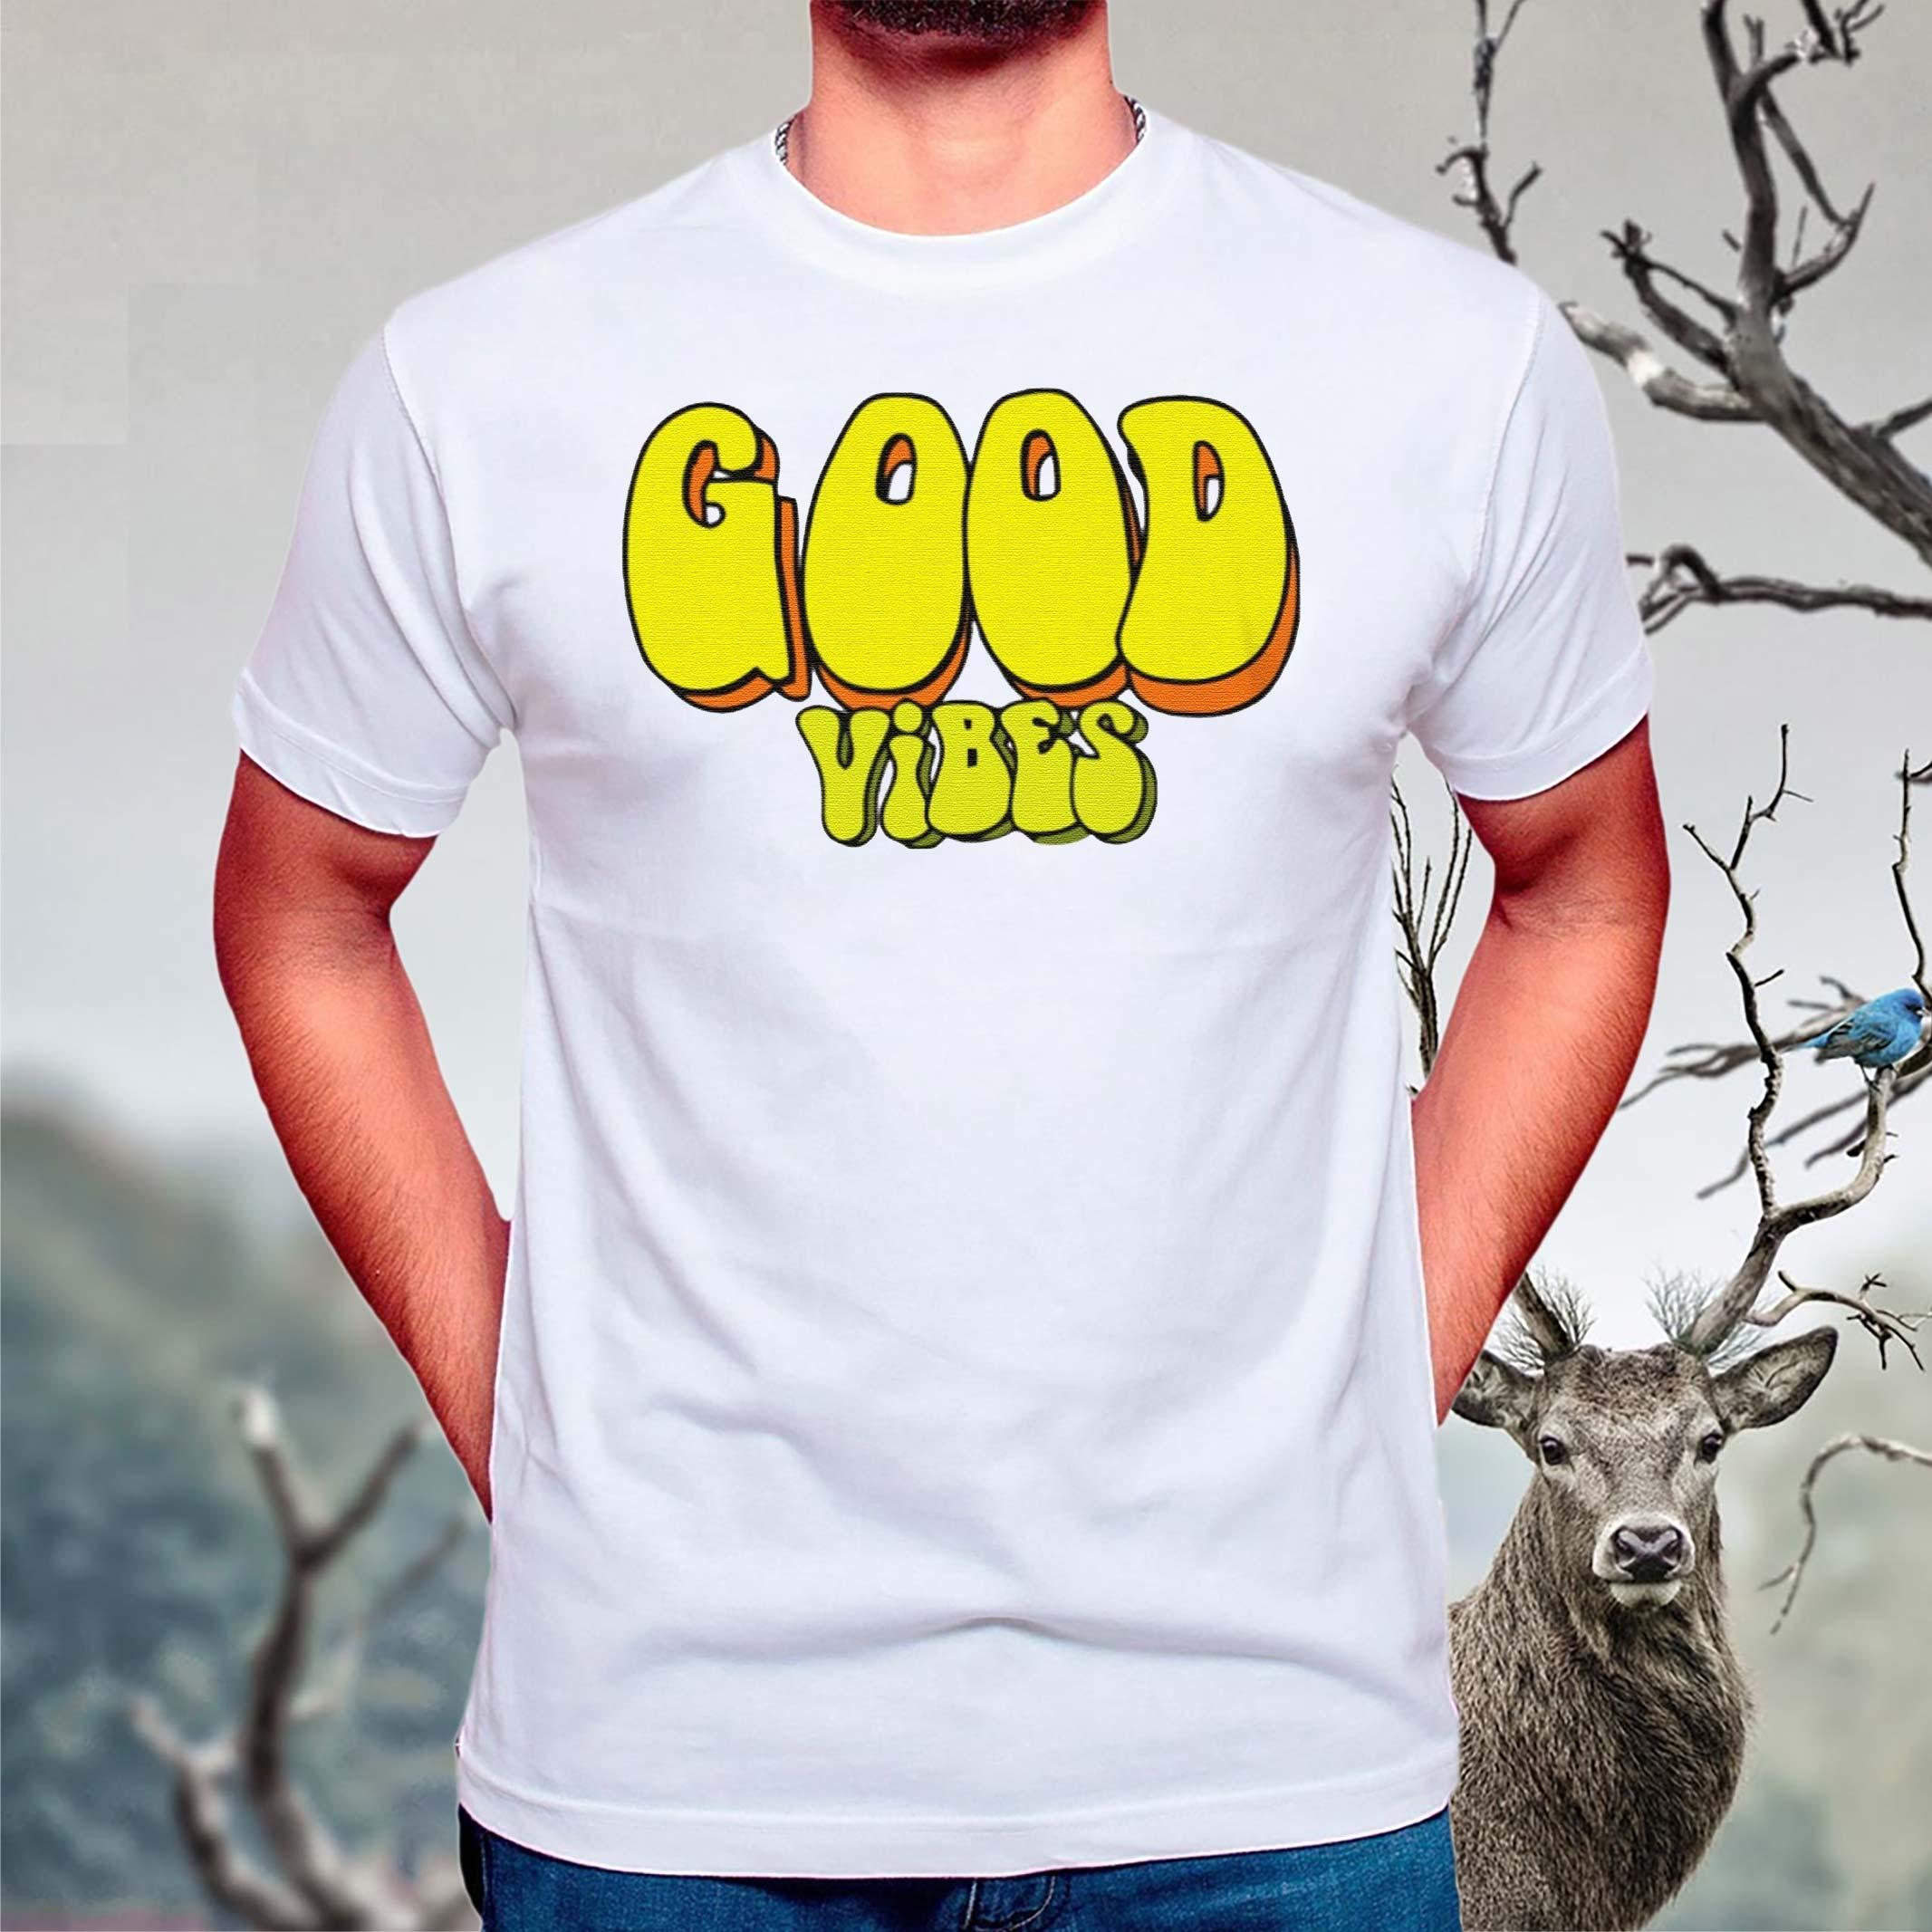 good-vibes-T-shirt